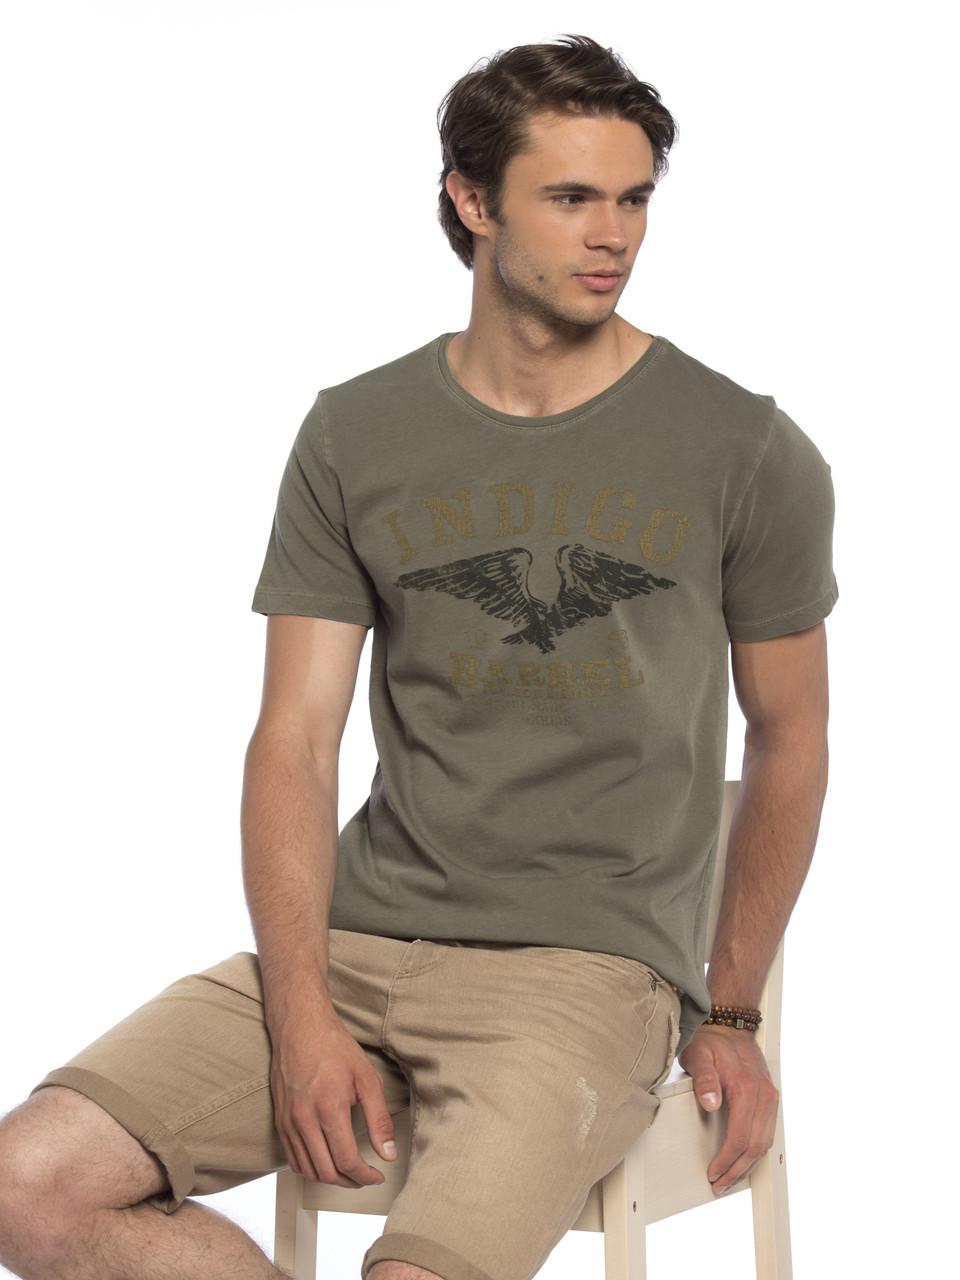 Мужская футболка Lc Waikiki / Лс Вайкики цвета хаки с надписью Indigo